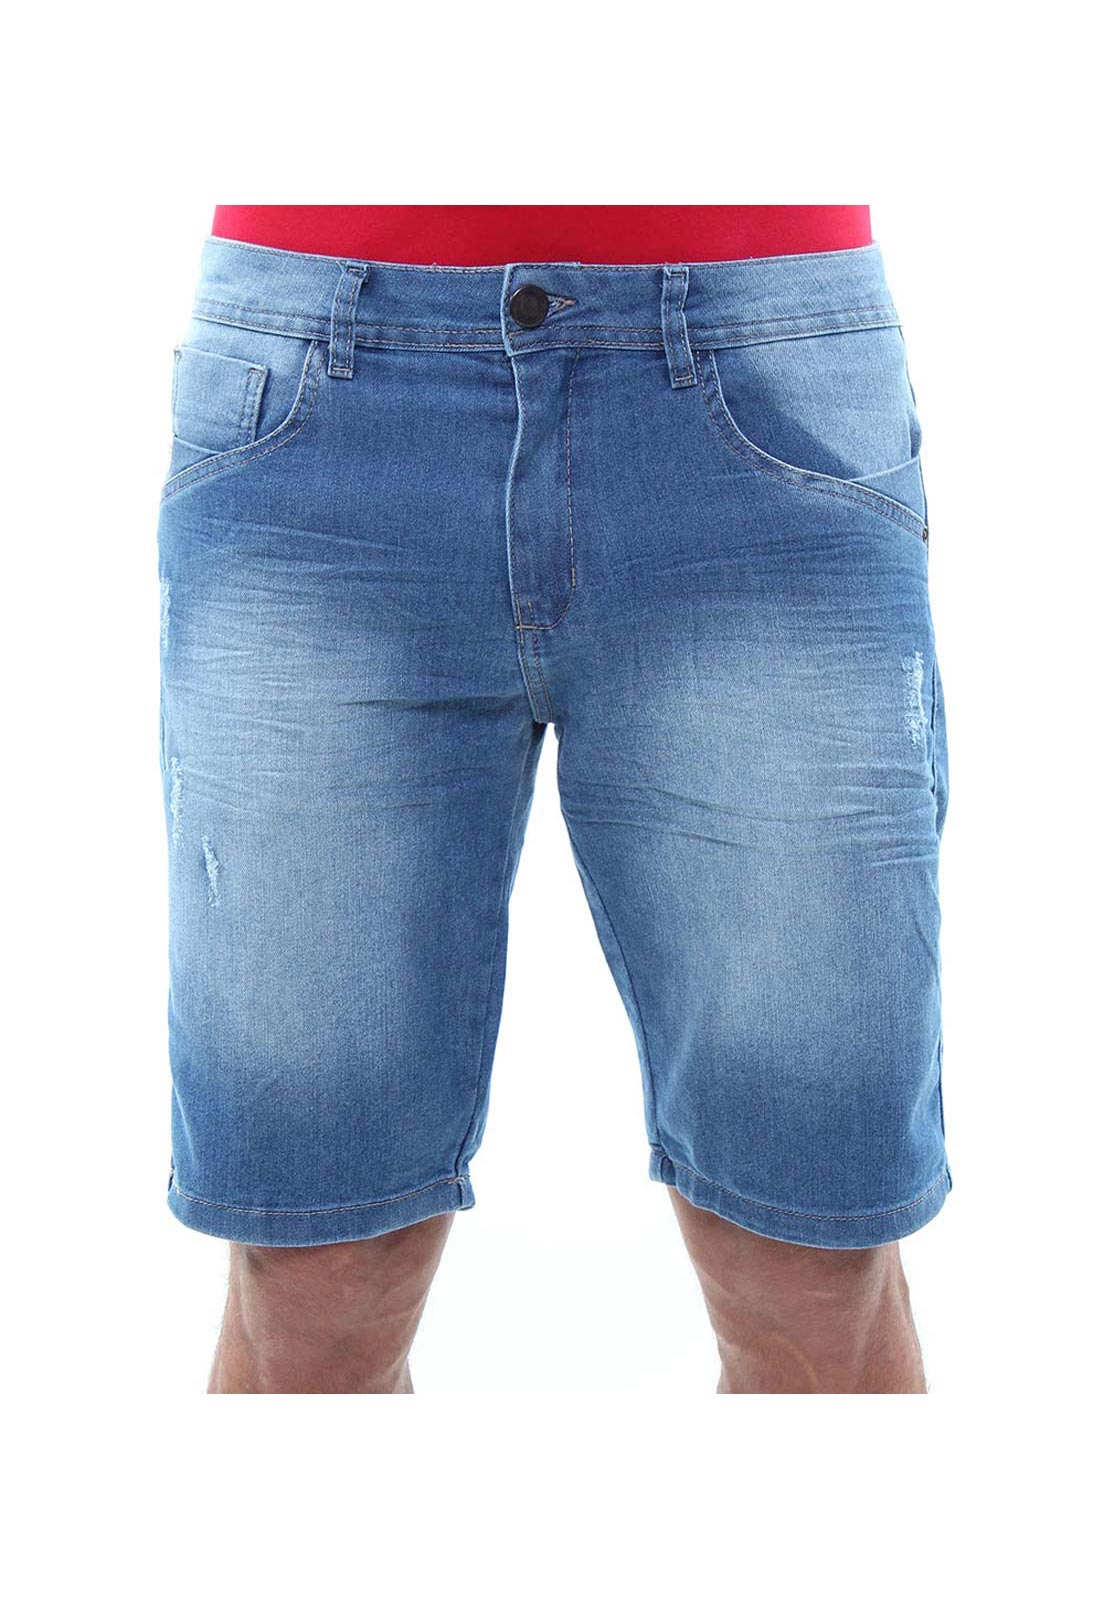 Bermuda Jeans Masculina Confort Crocker - 47742  - CROCKER JEANS